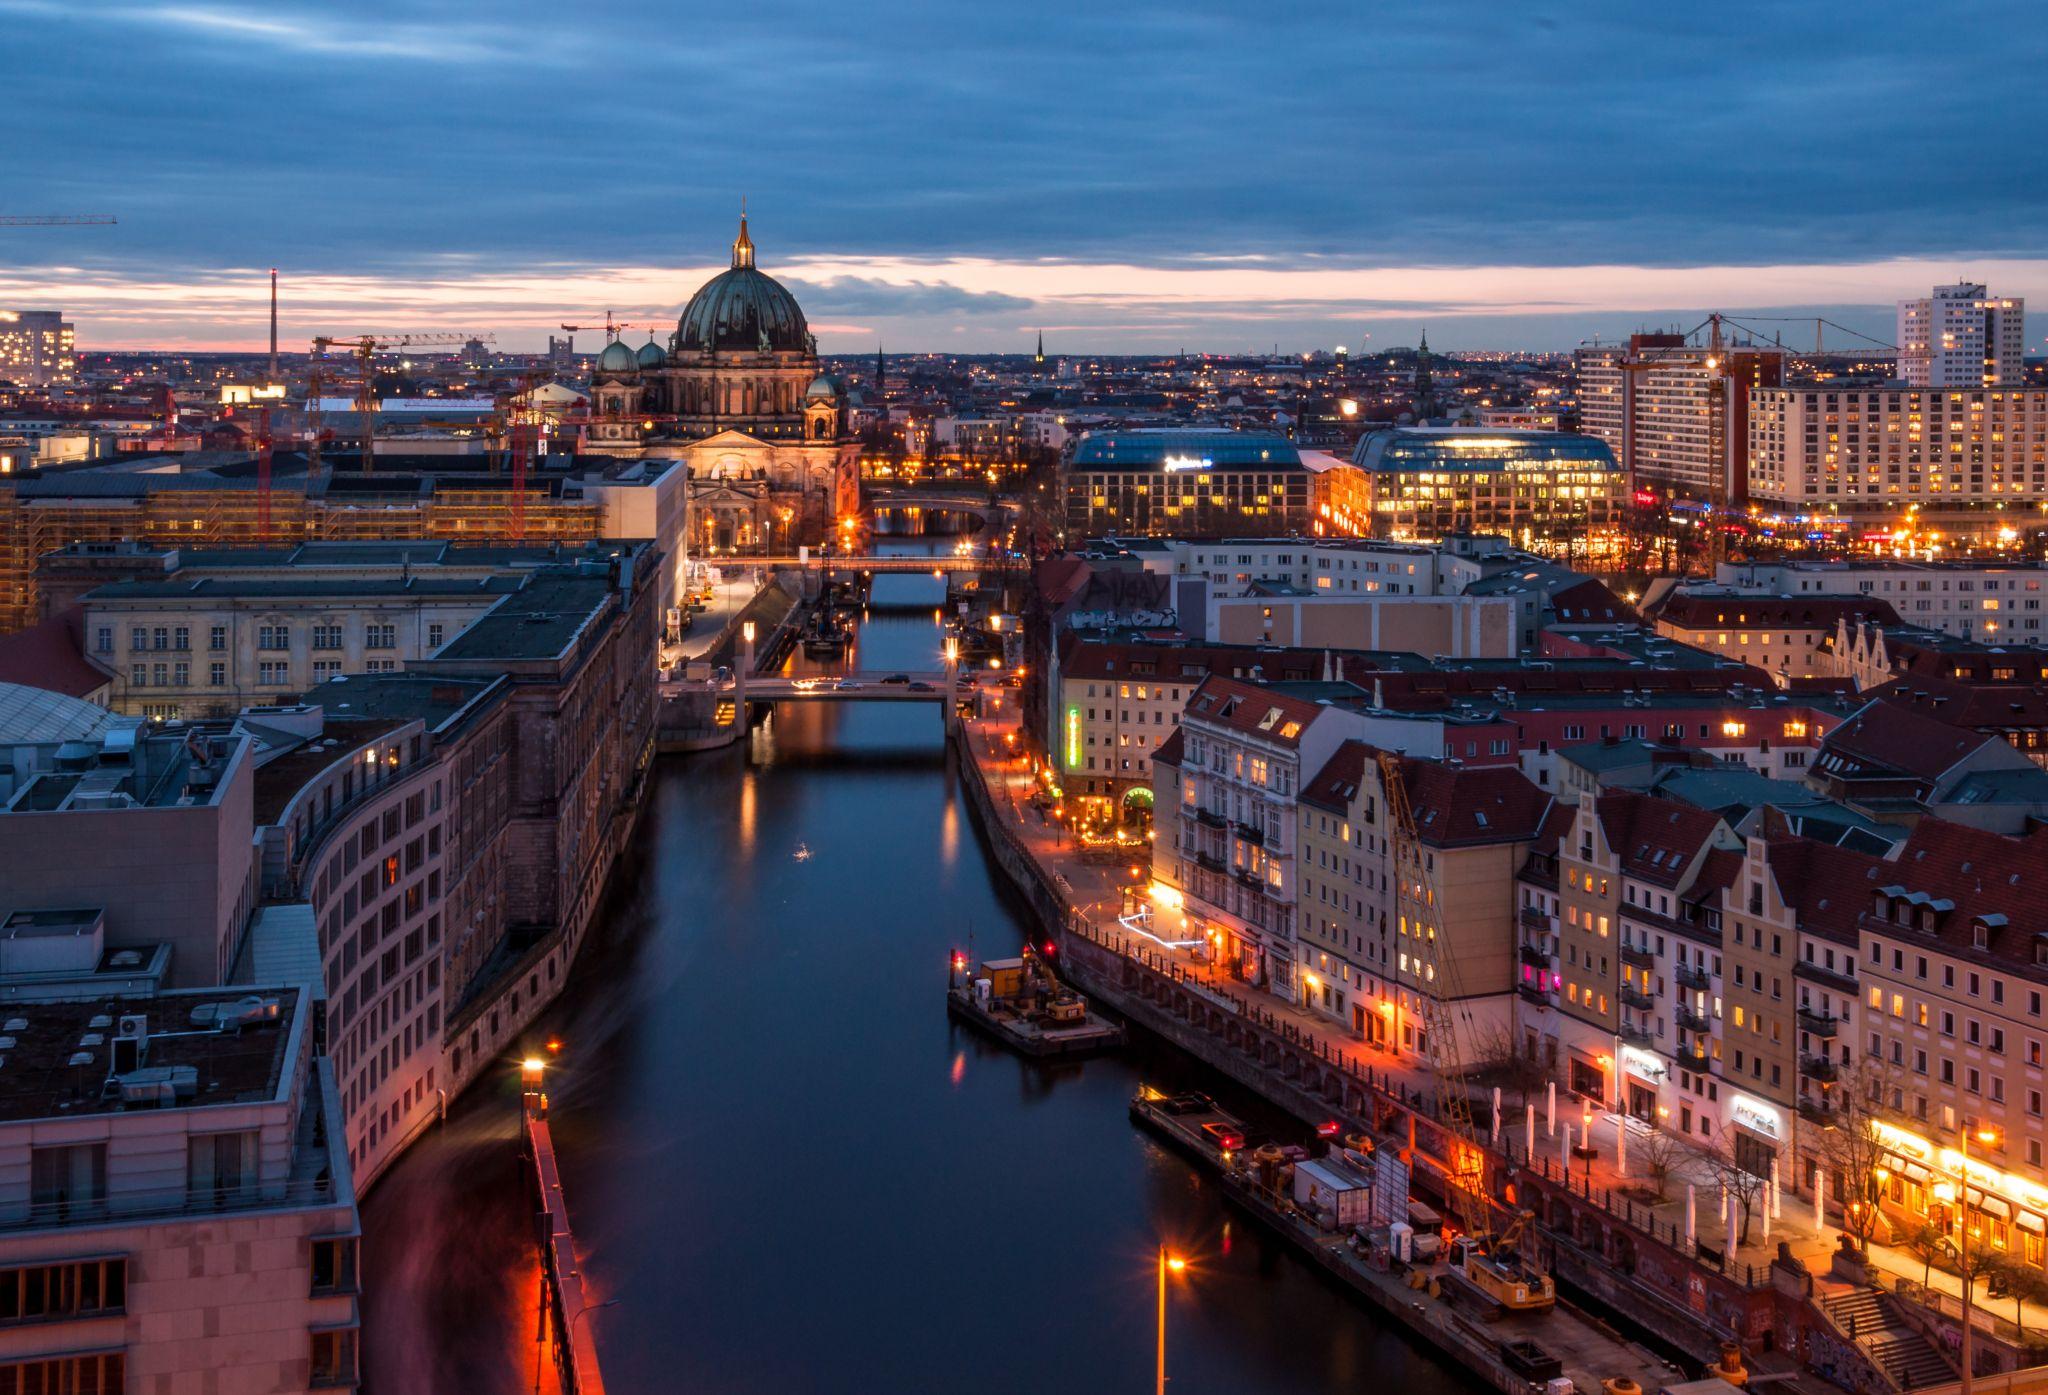 Вечерняя панорама центра Берлина